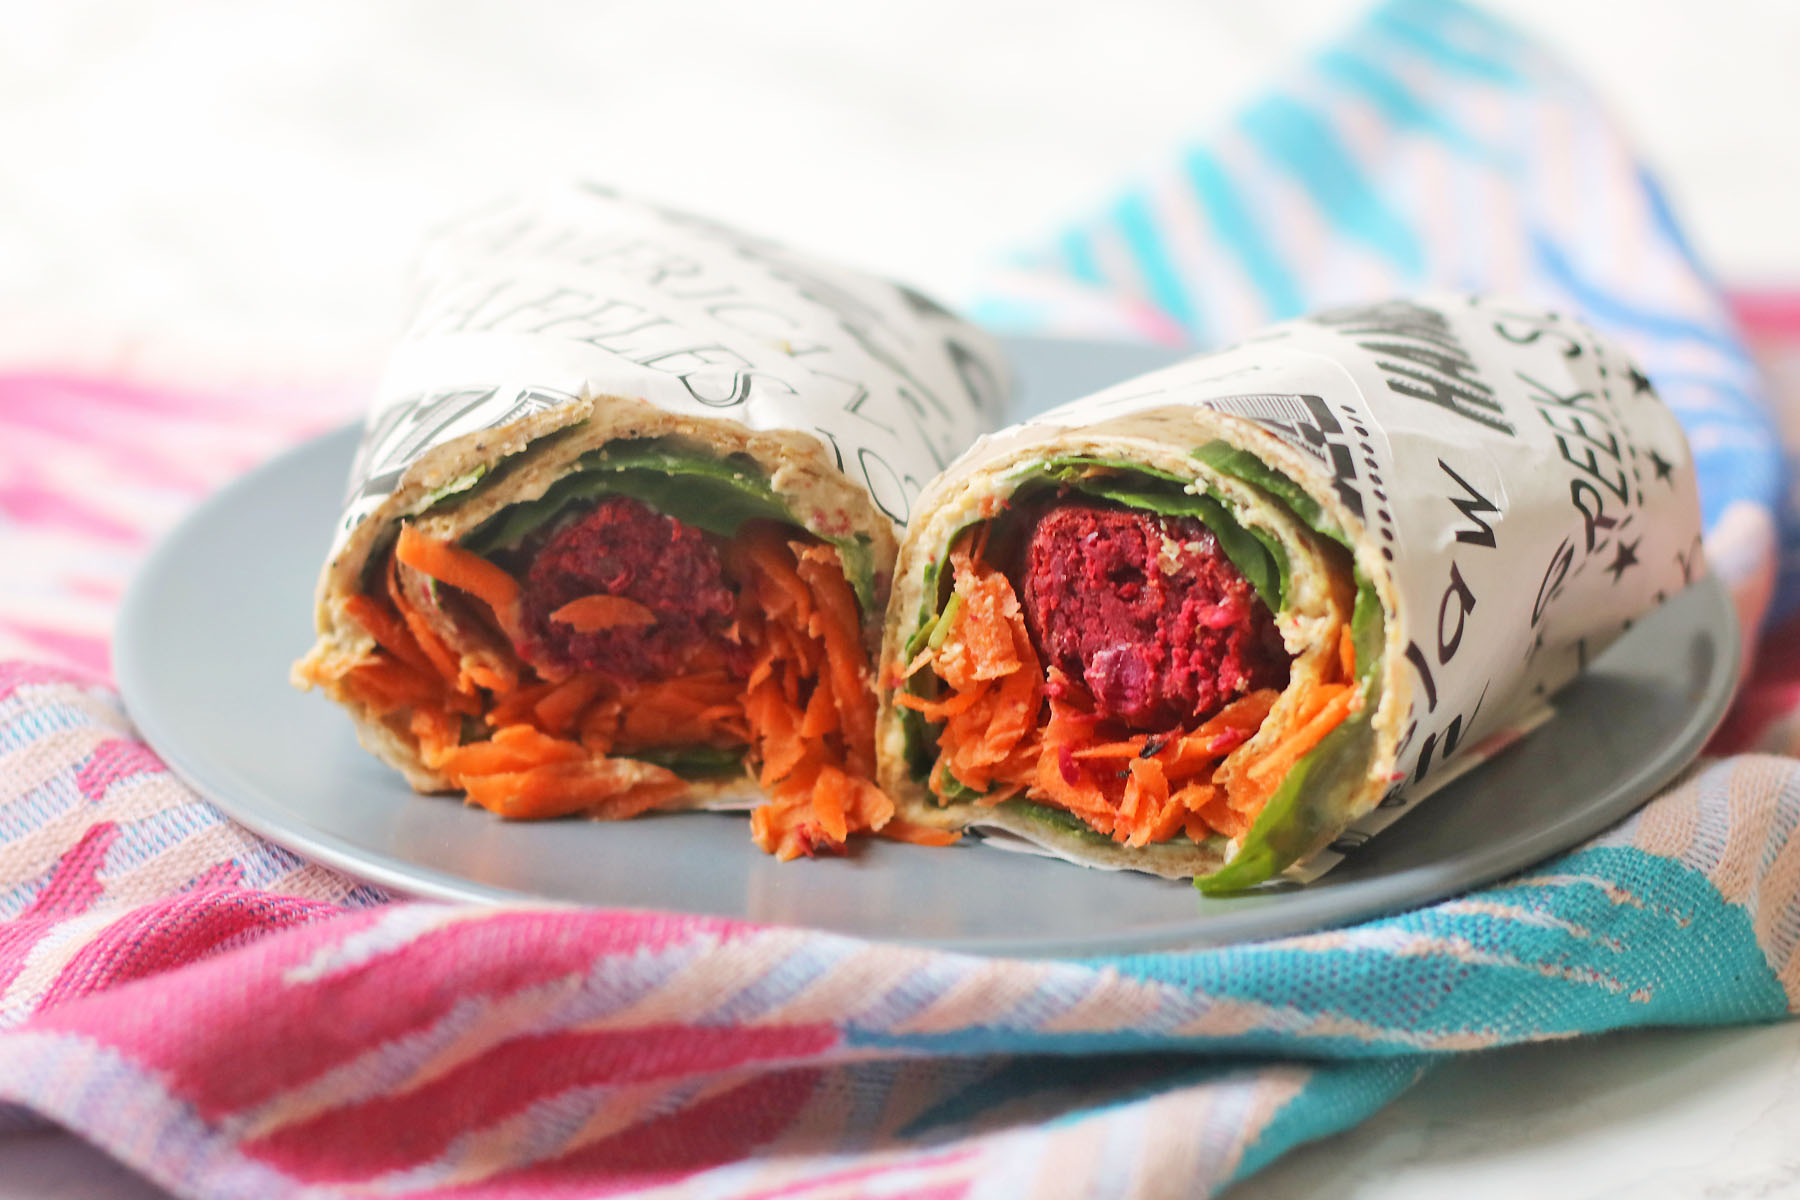 Rainbow Falafel and Hummus Wrap